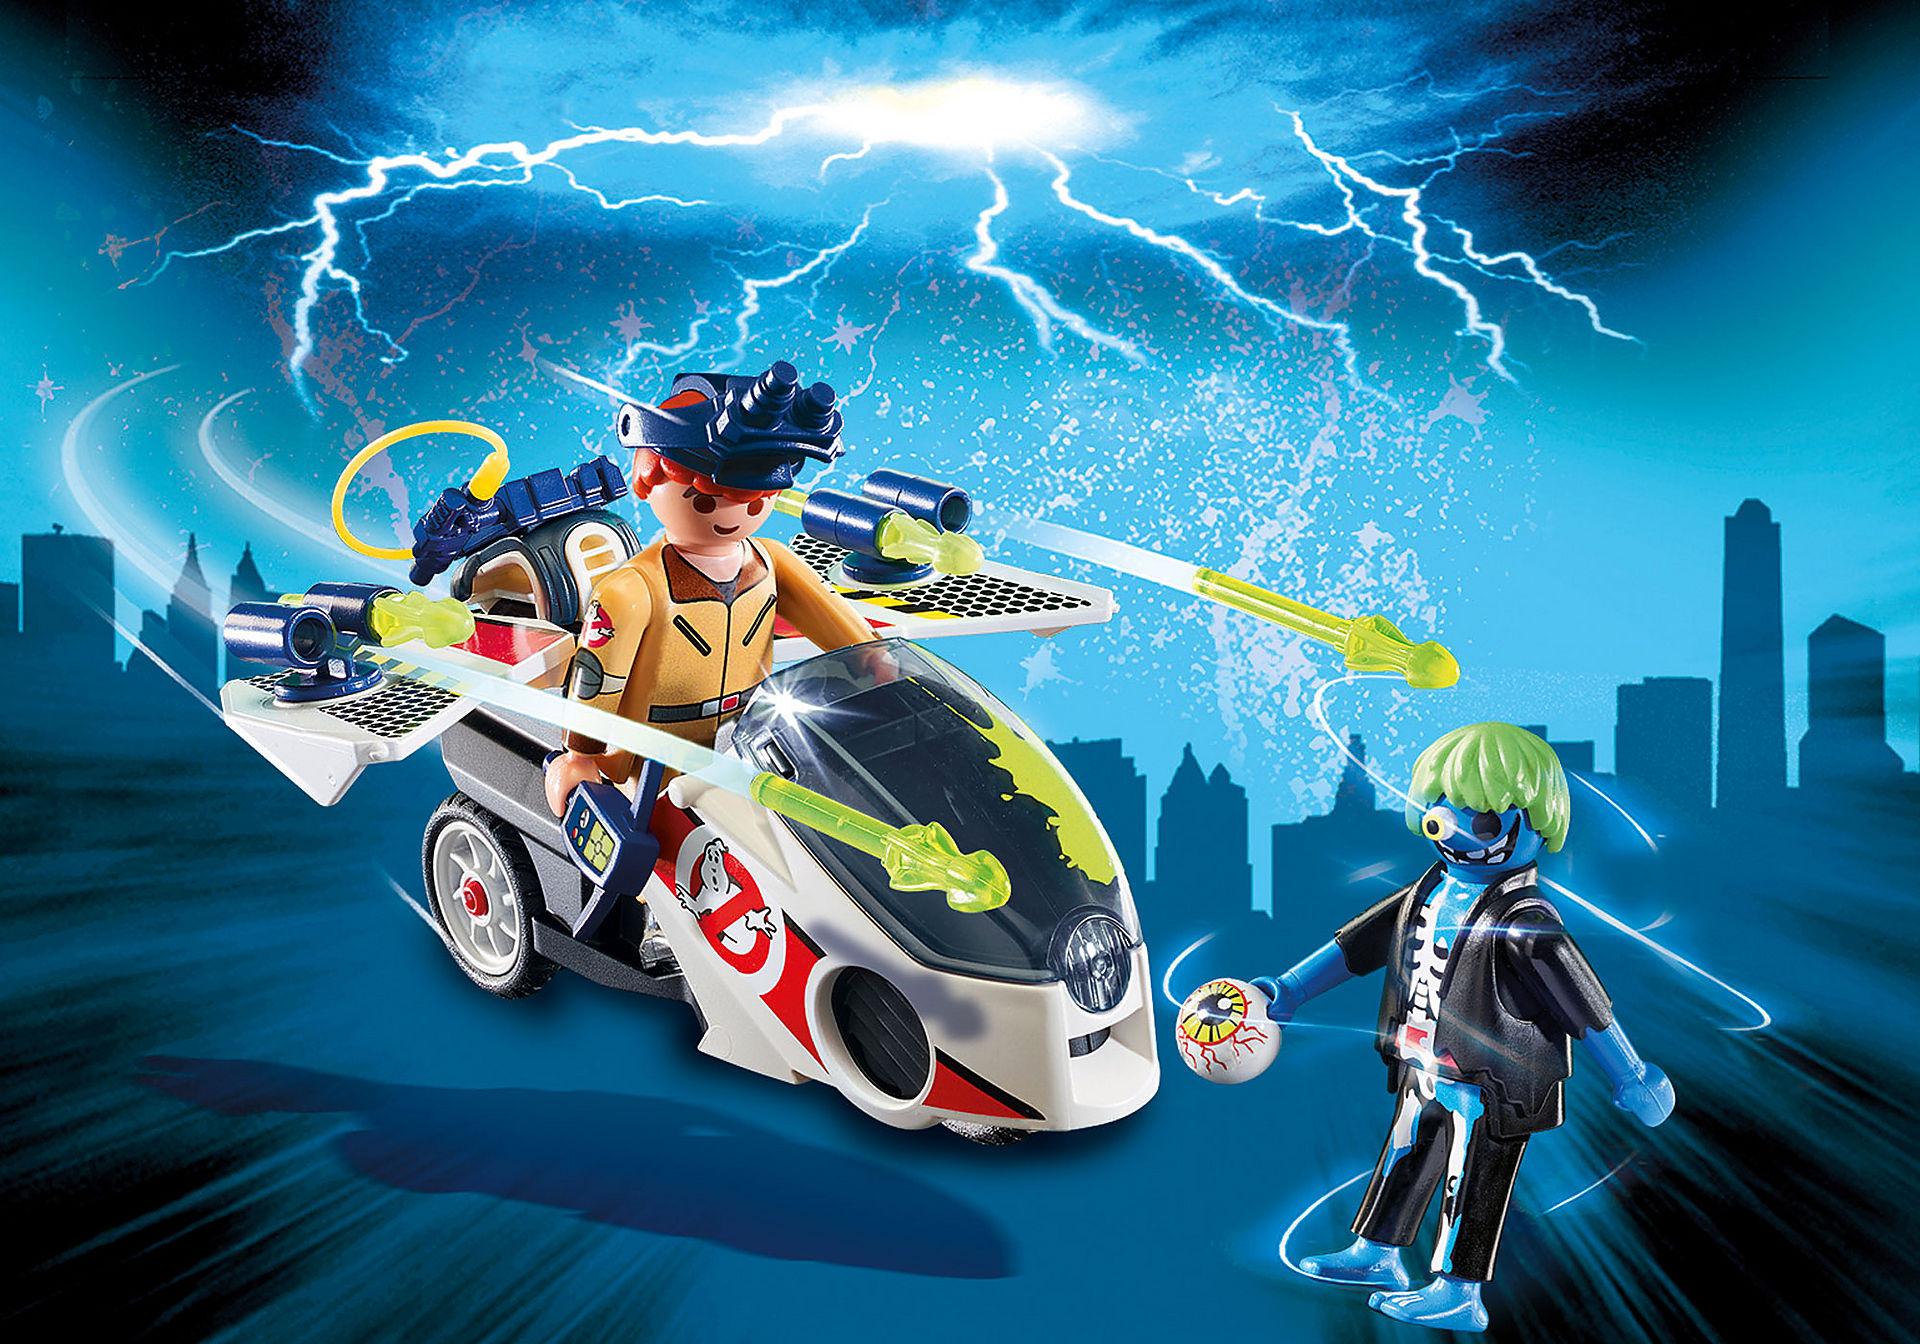 http://media.playmobil.com/i/playmobil/9388_product_detail/Δρ. Σταντζ με Skybike